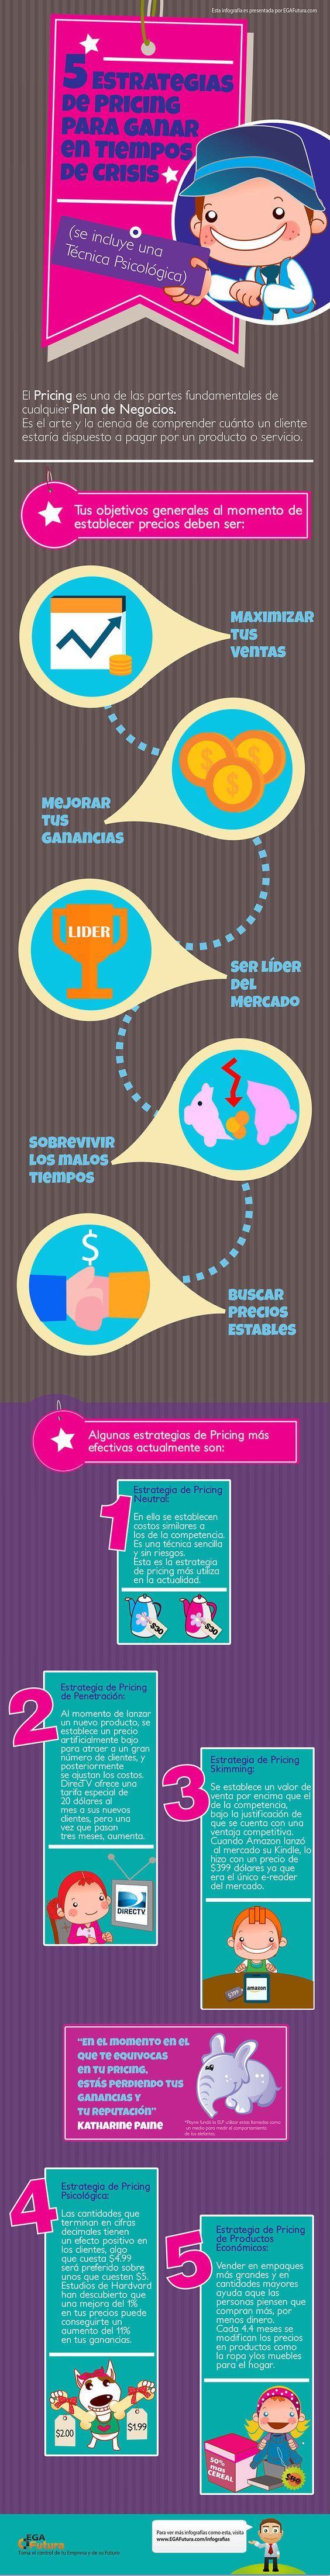 #Infografia #Marketing 5 Estrategias de Pricing. #TAVnews #arteparaempresa #activate #sueña #emprendimiento #Marketing #motivacion